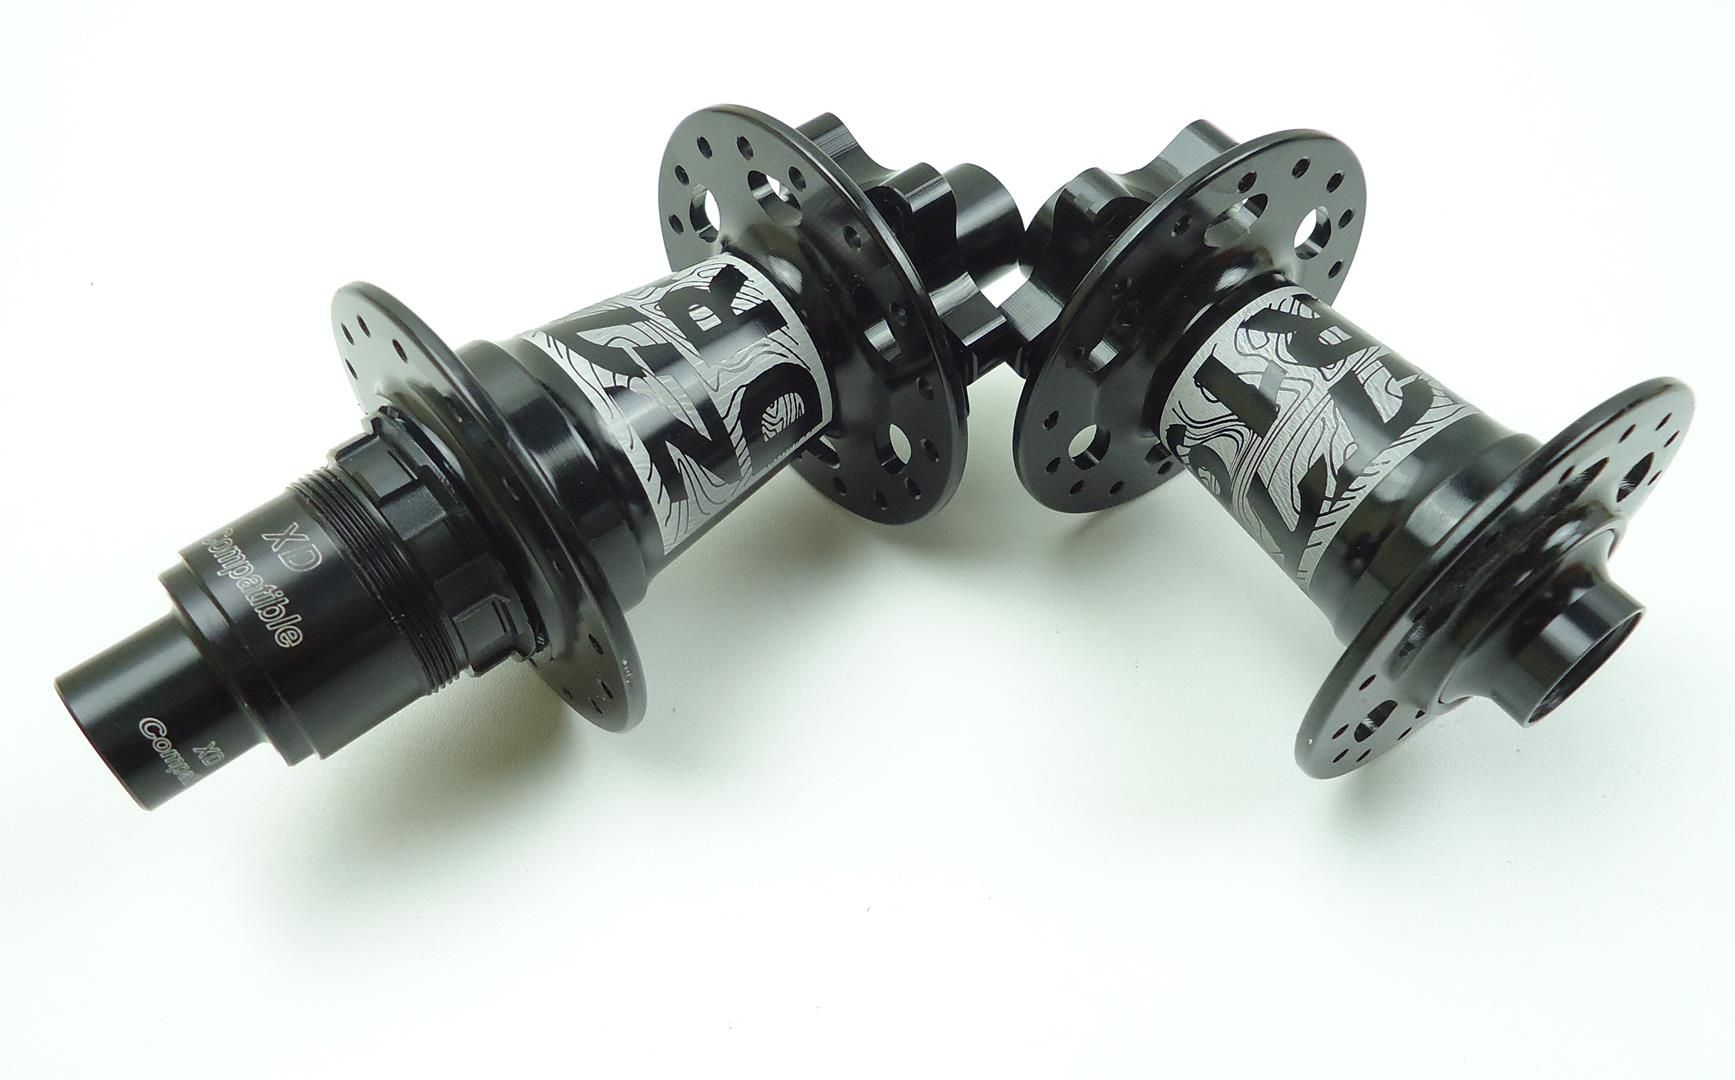 Par de Cubos ZTTO DR190 Sram XD 32 Furos Eixo Normal ou 142mm Sistema Ratchet Igual DT Swiss